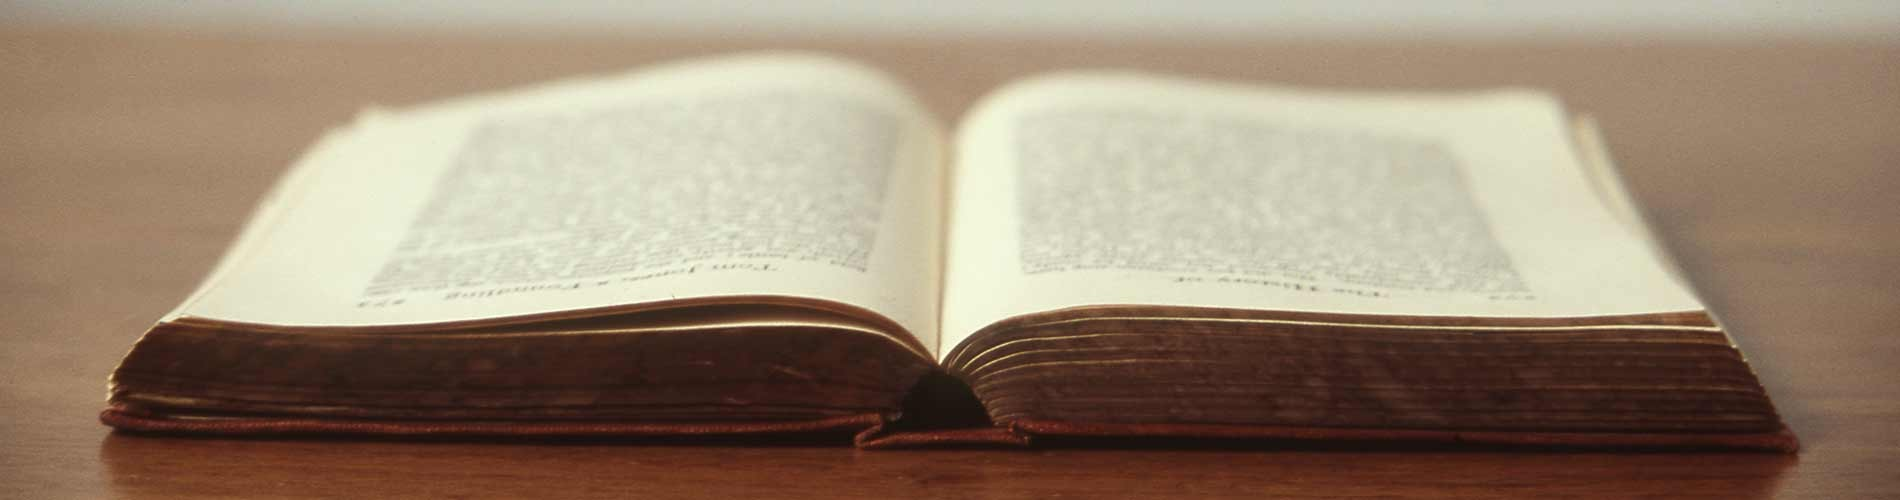 Libreria Esoterica Cavour - di Elisa Martinelli & C.